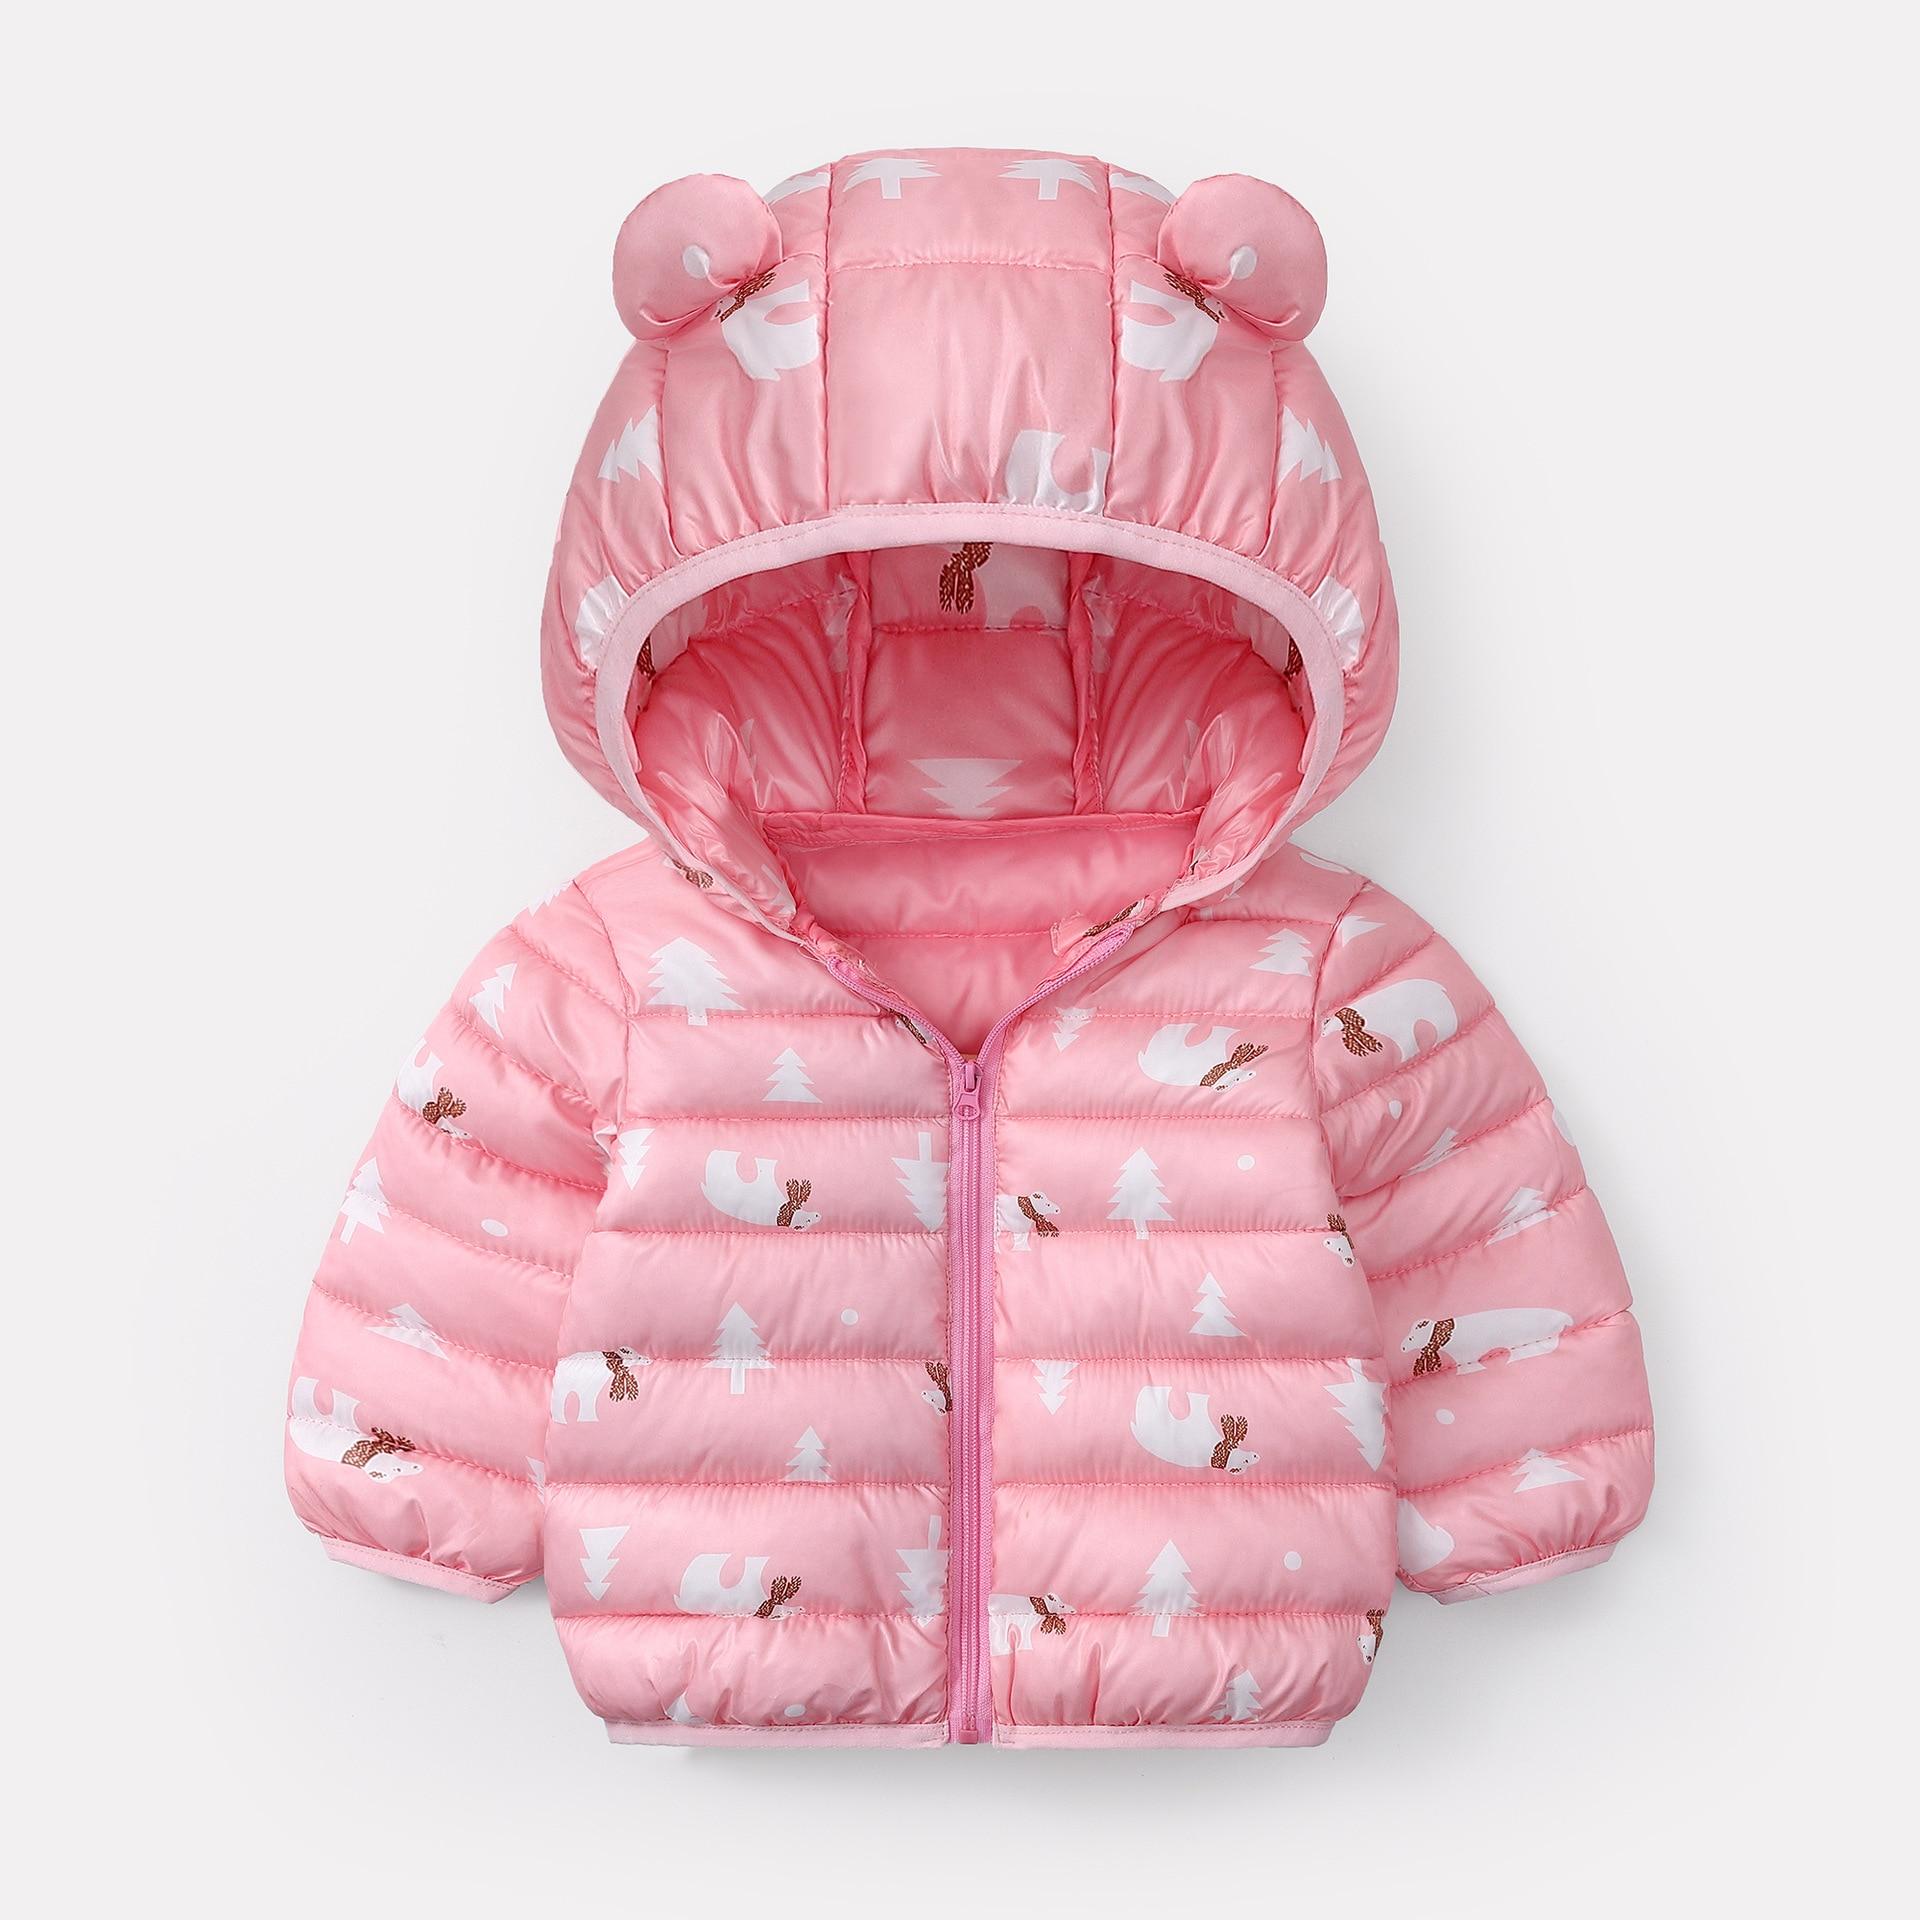 Toddler Baby Boys Girls Jacket Coat Kids Warm Winter Coats Outerwear 2-6T